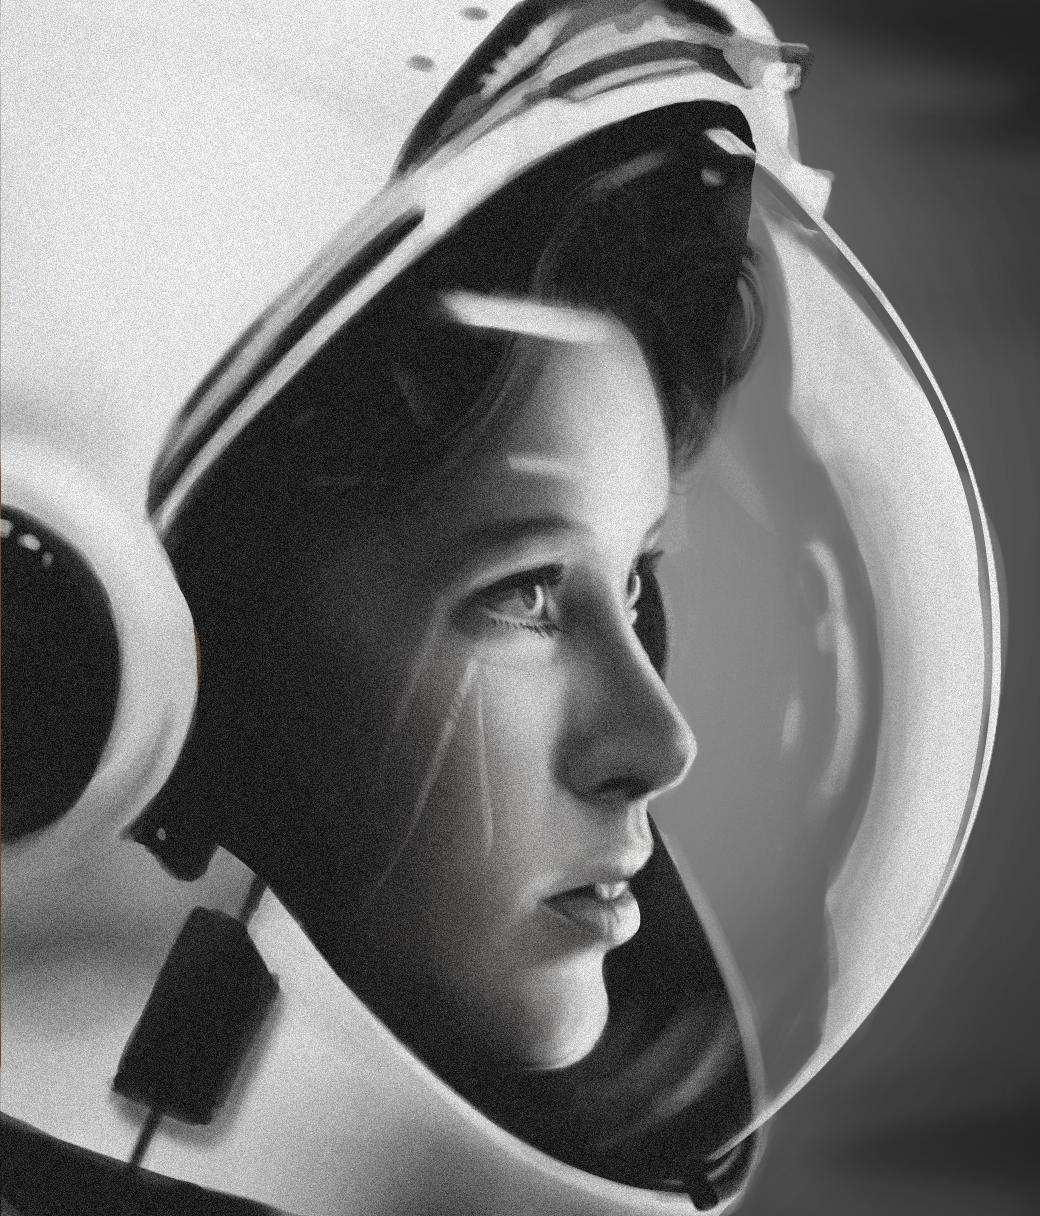 anna female astronaut - photo #11